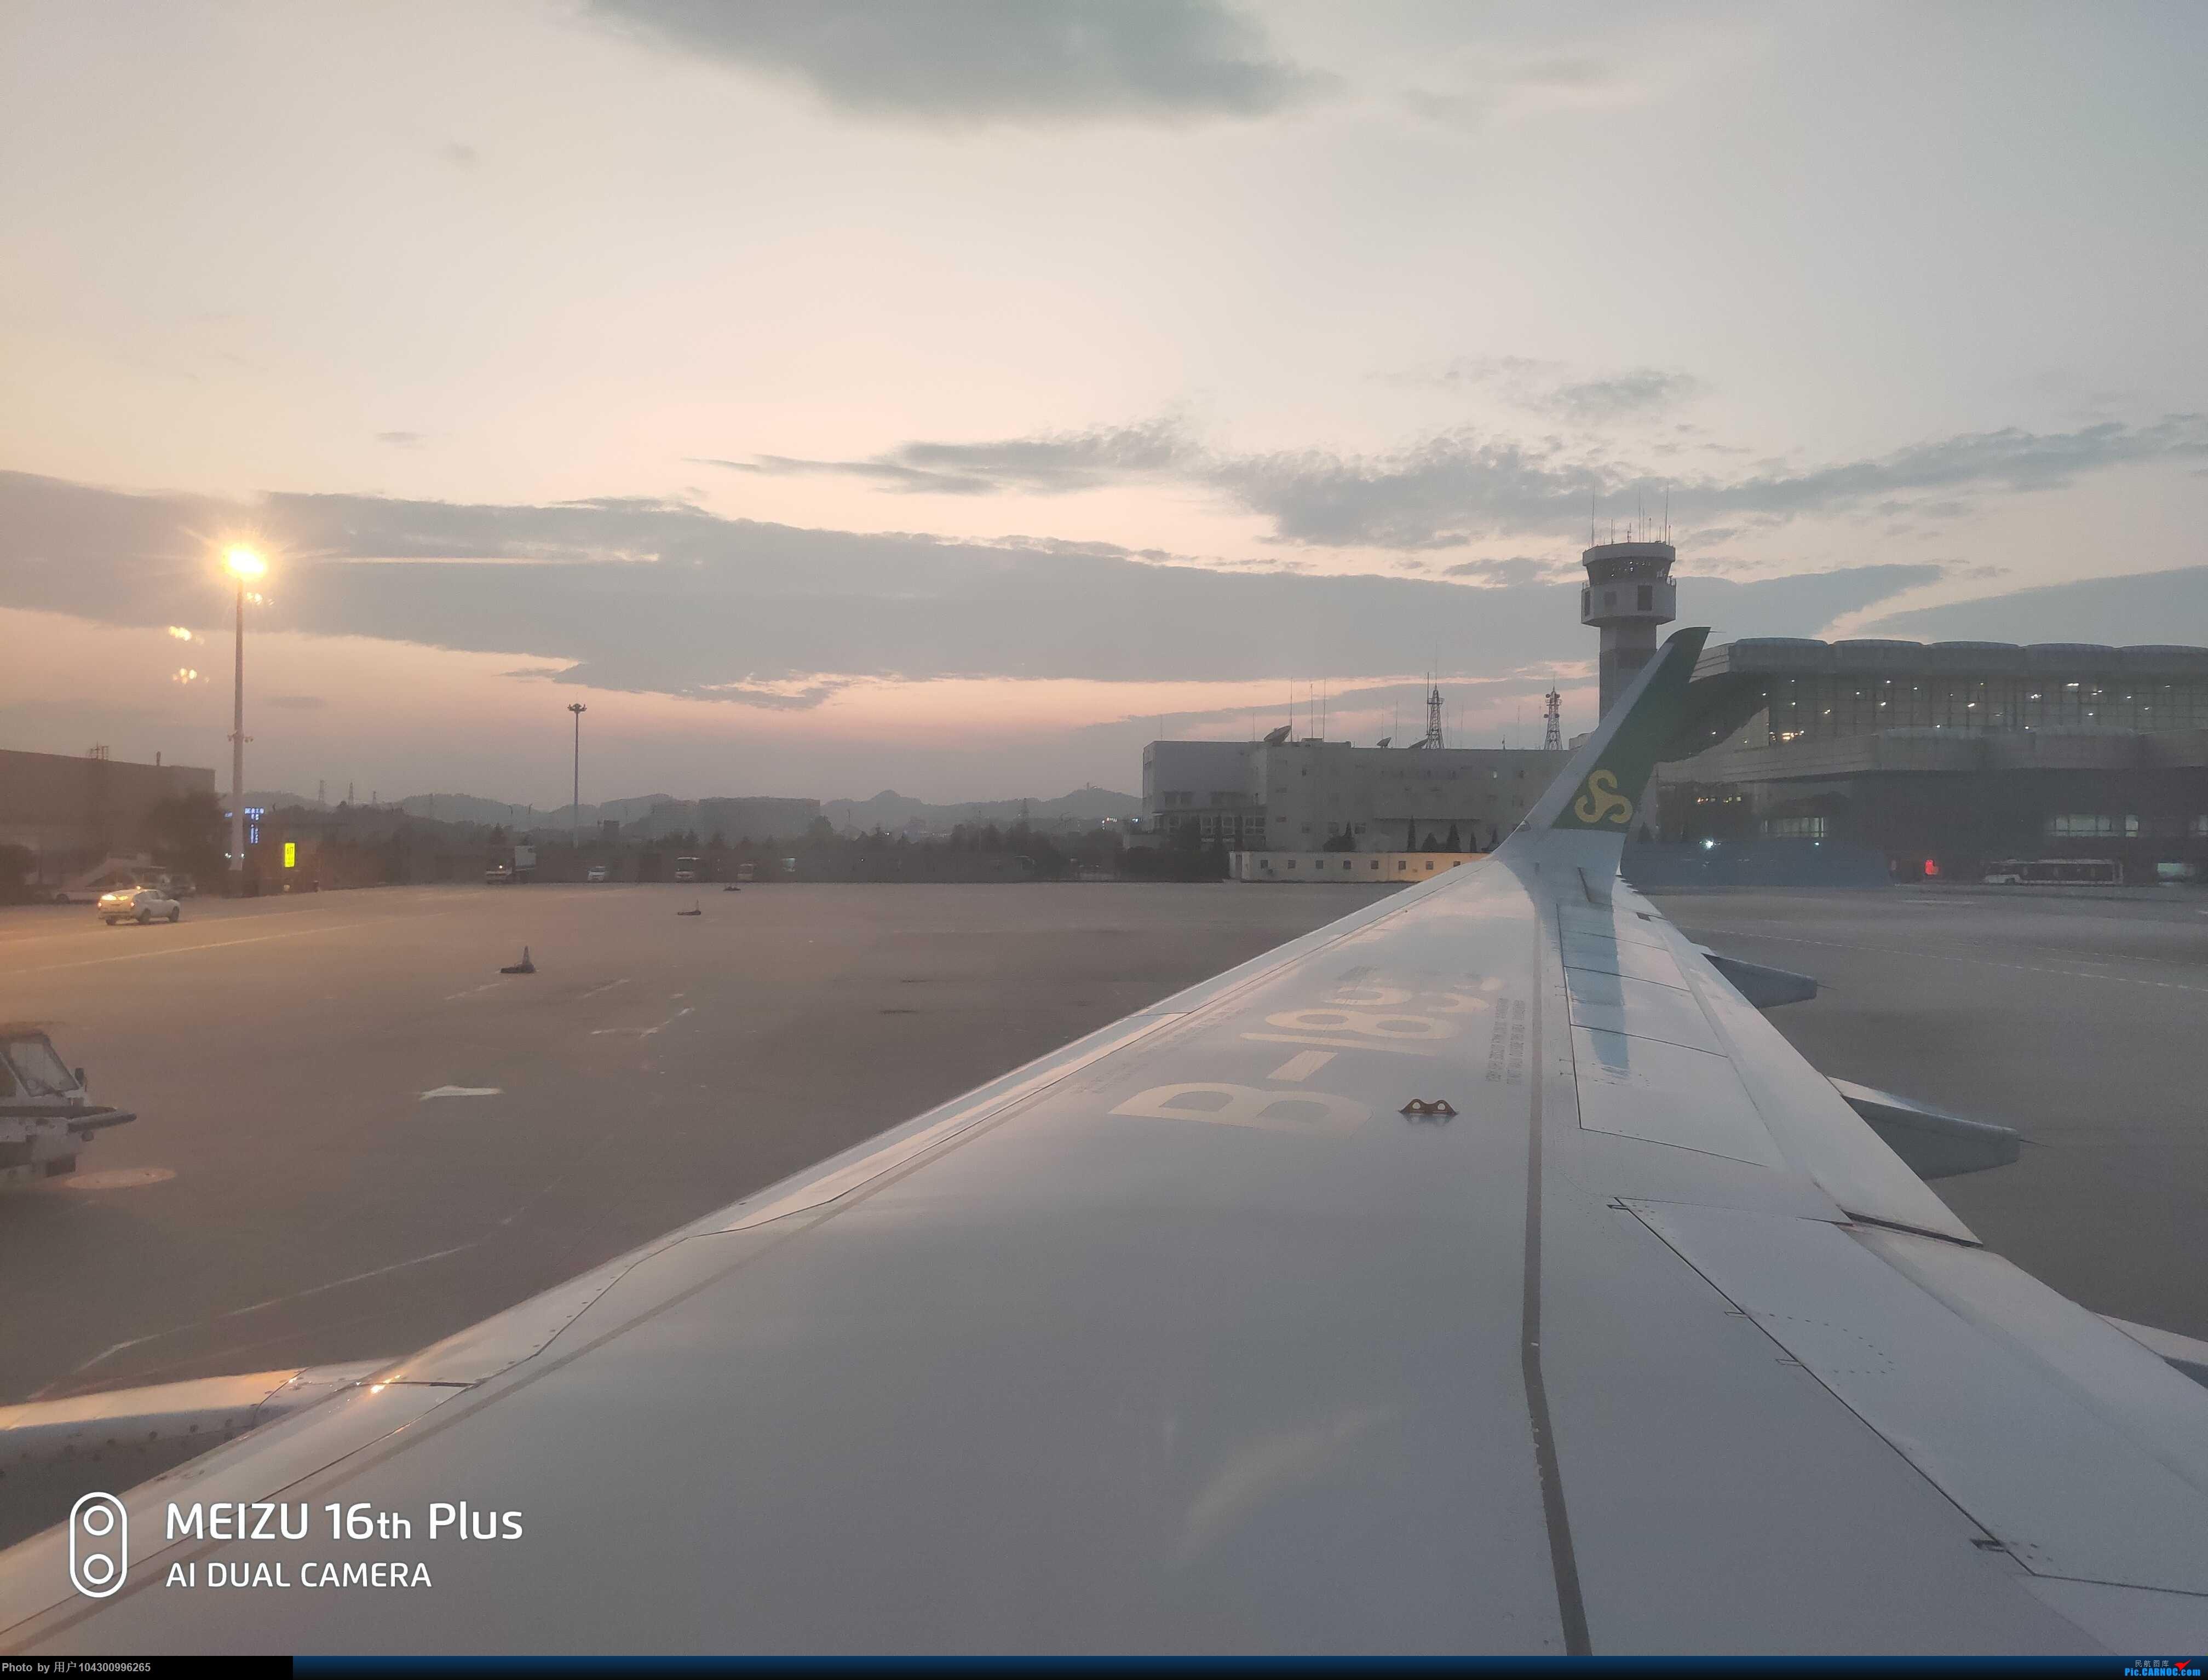 Re:[原创]DM游记之9C广元--贵阳 AIRBUS A320-200 B-1895 中国贵阳龙洞堡国际机场